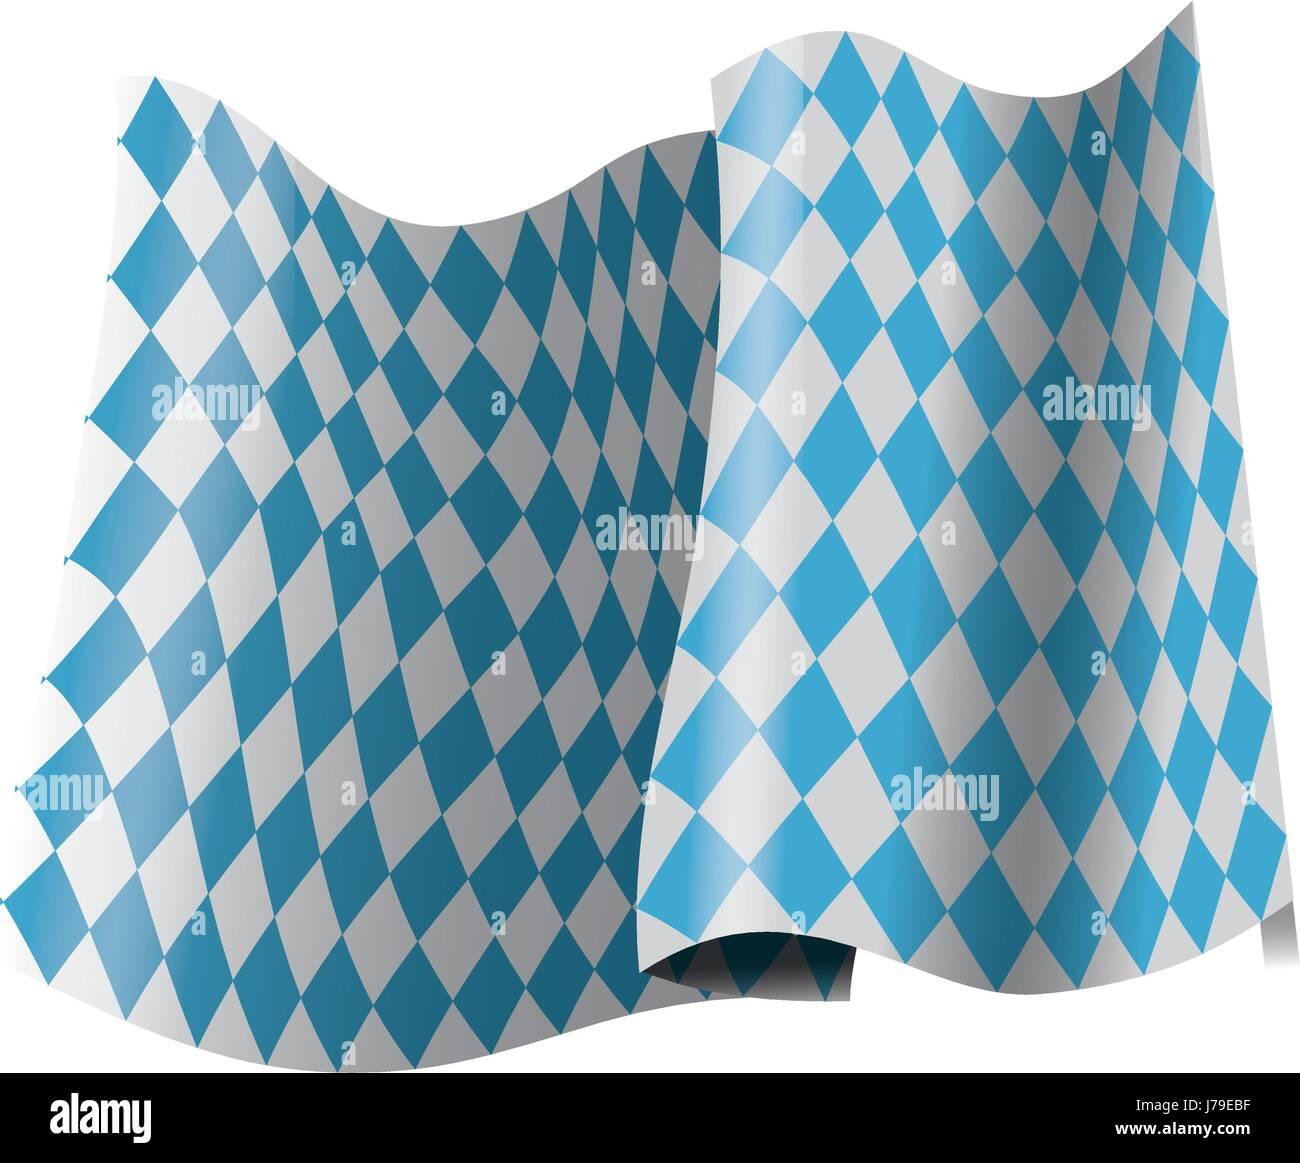 bavarian official flag, symbol, banner. oktoberfest cwelebration - Stock Vector